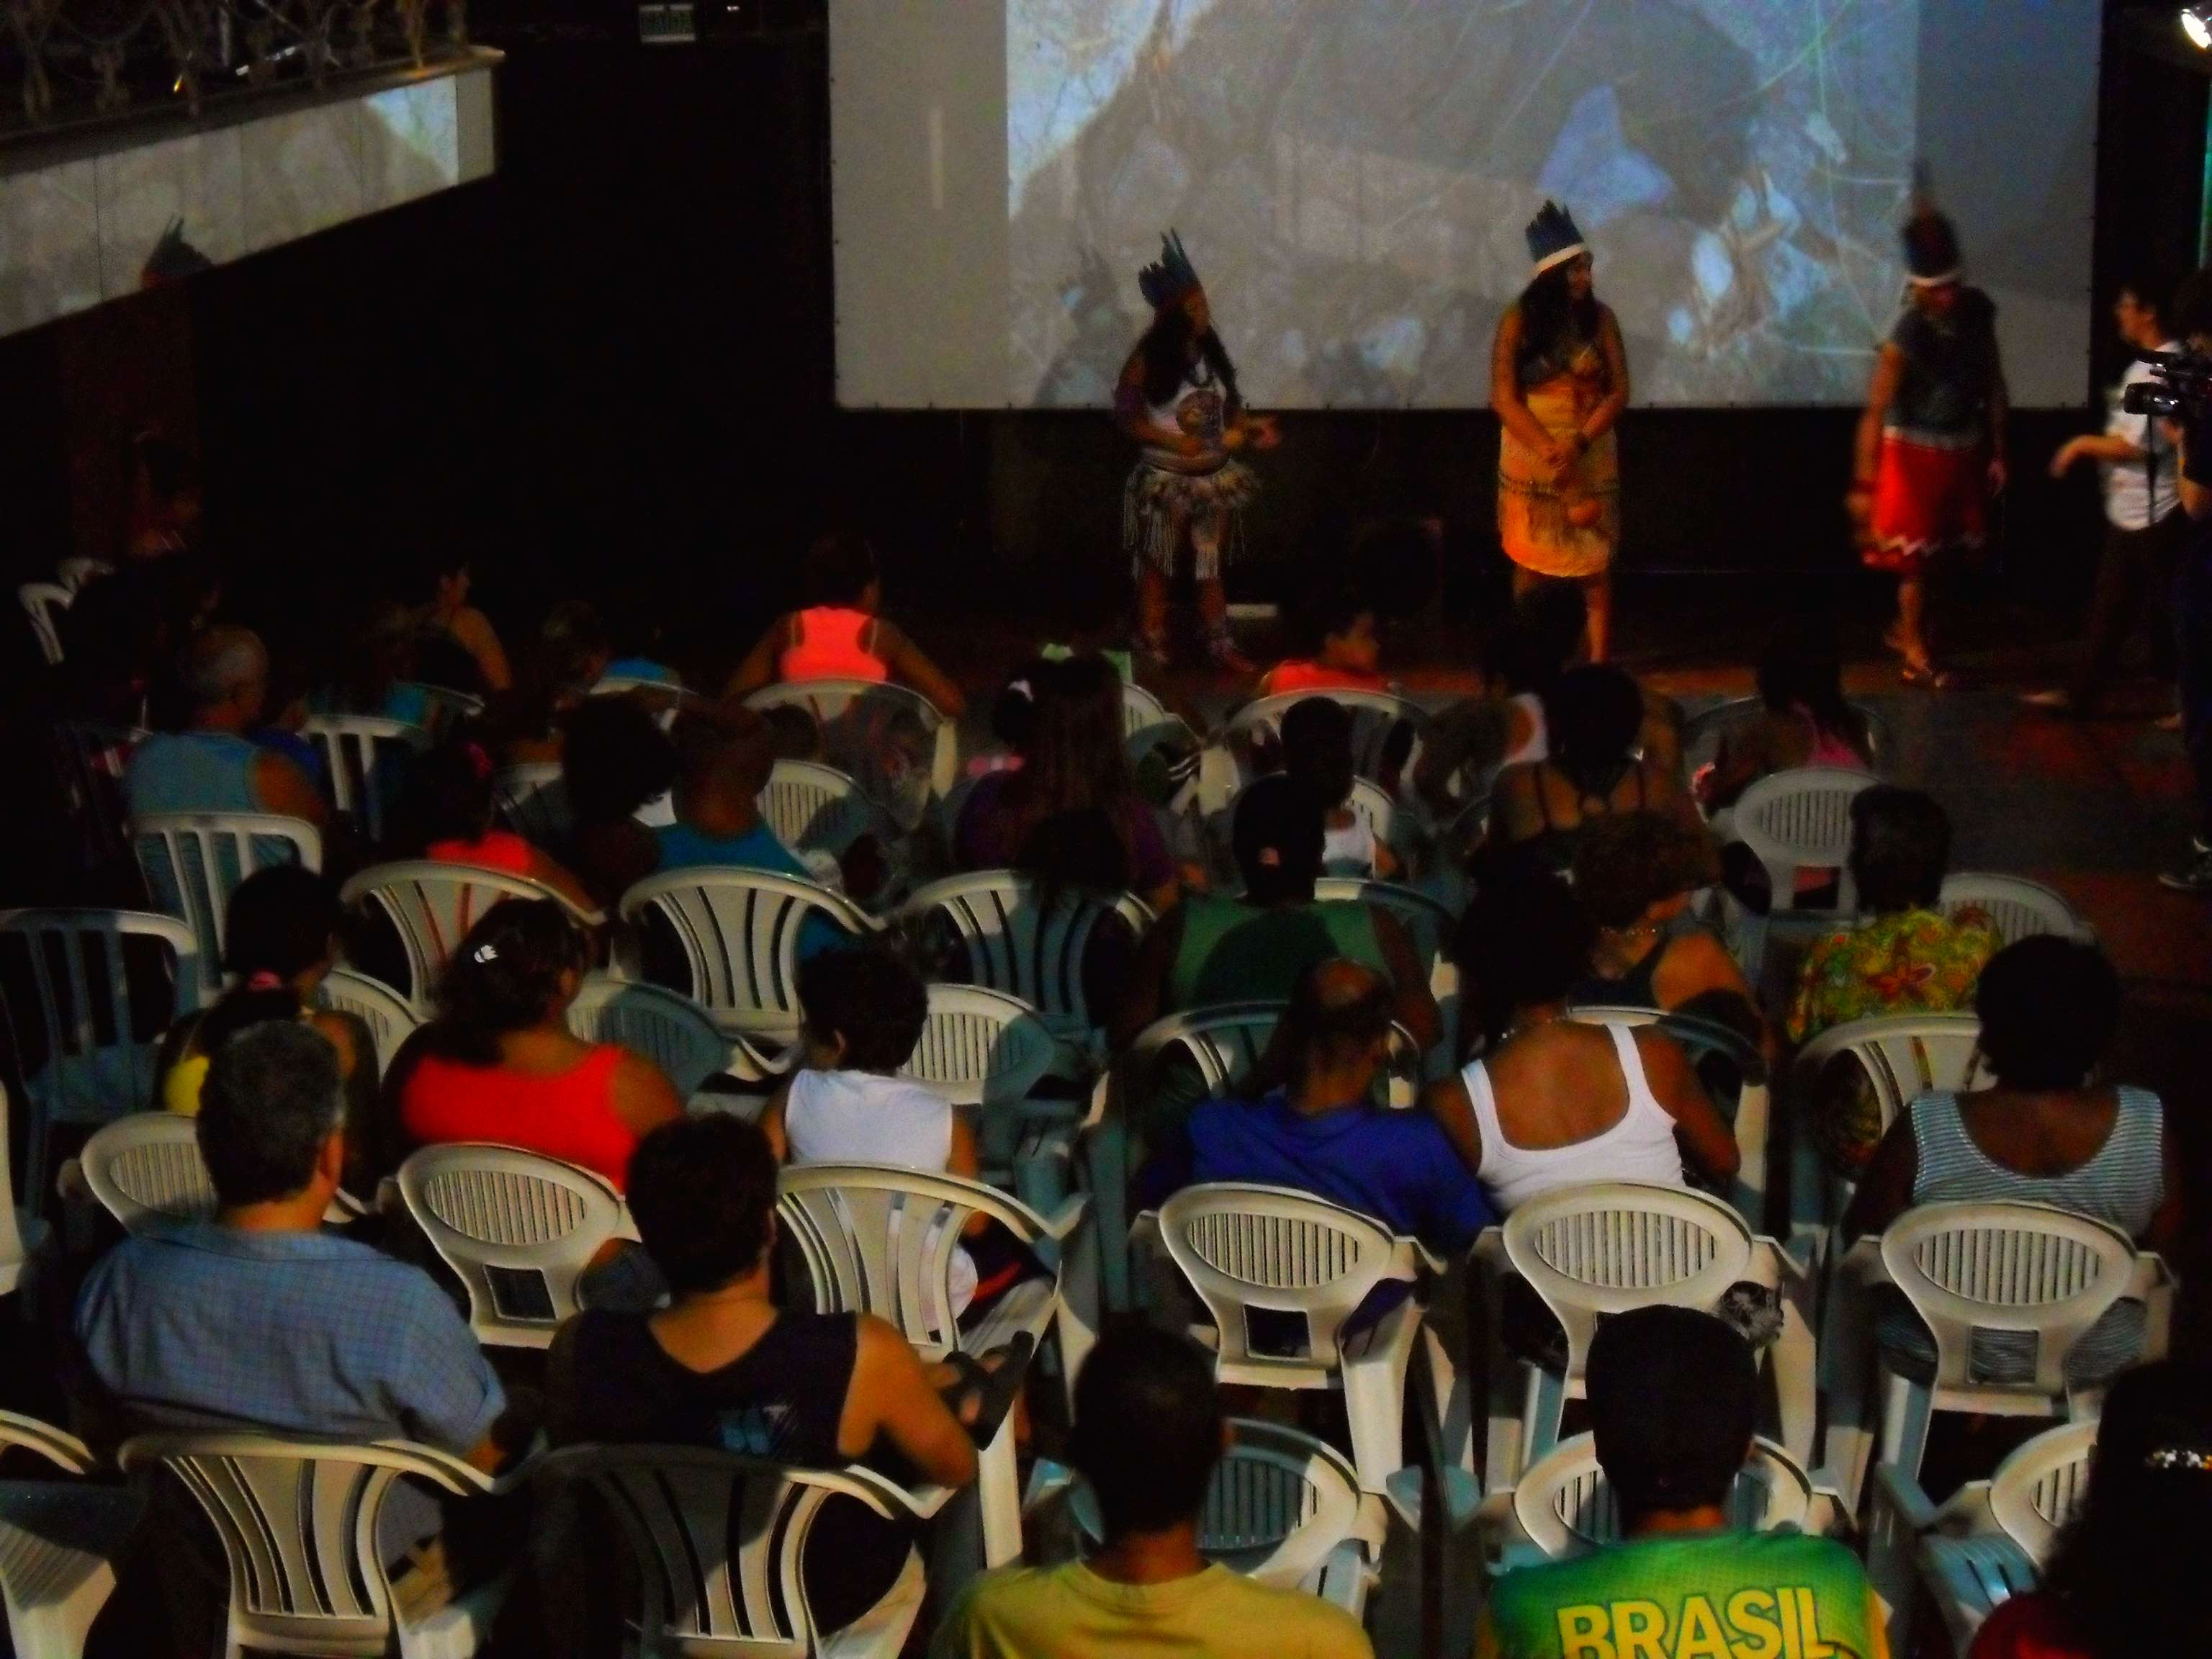 Mostra Cine Índio Brasil - Microcine Bonsucesso